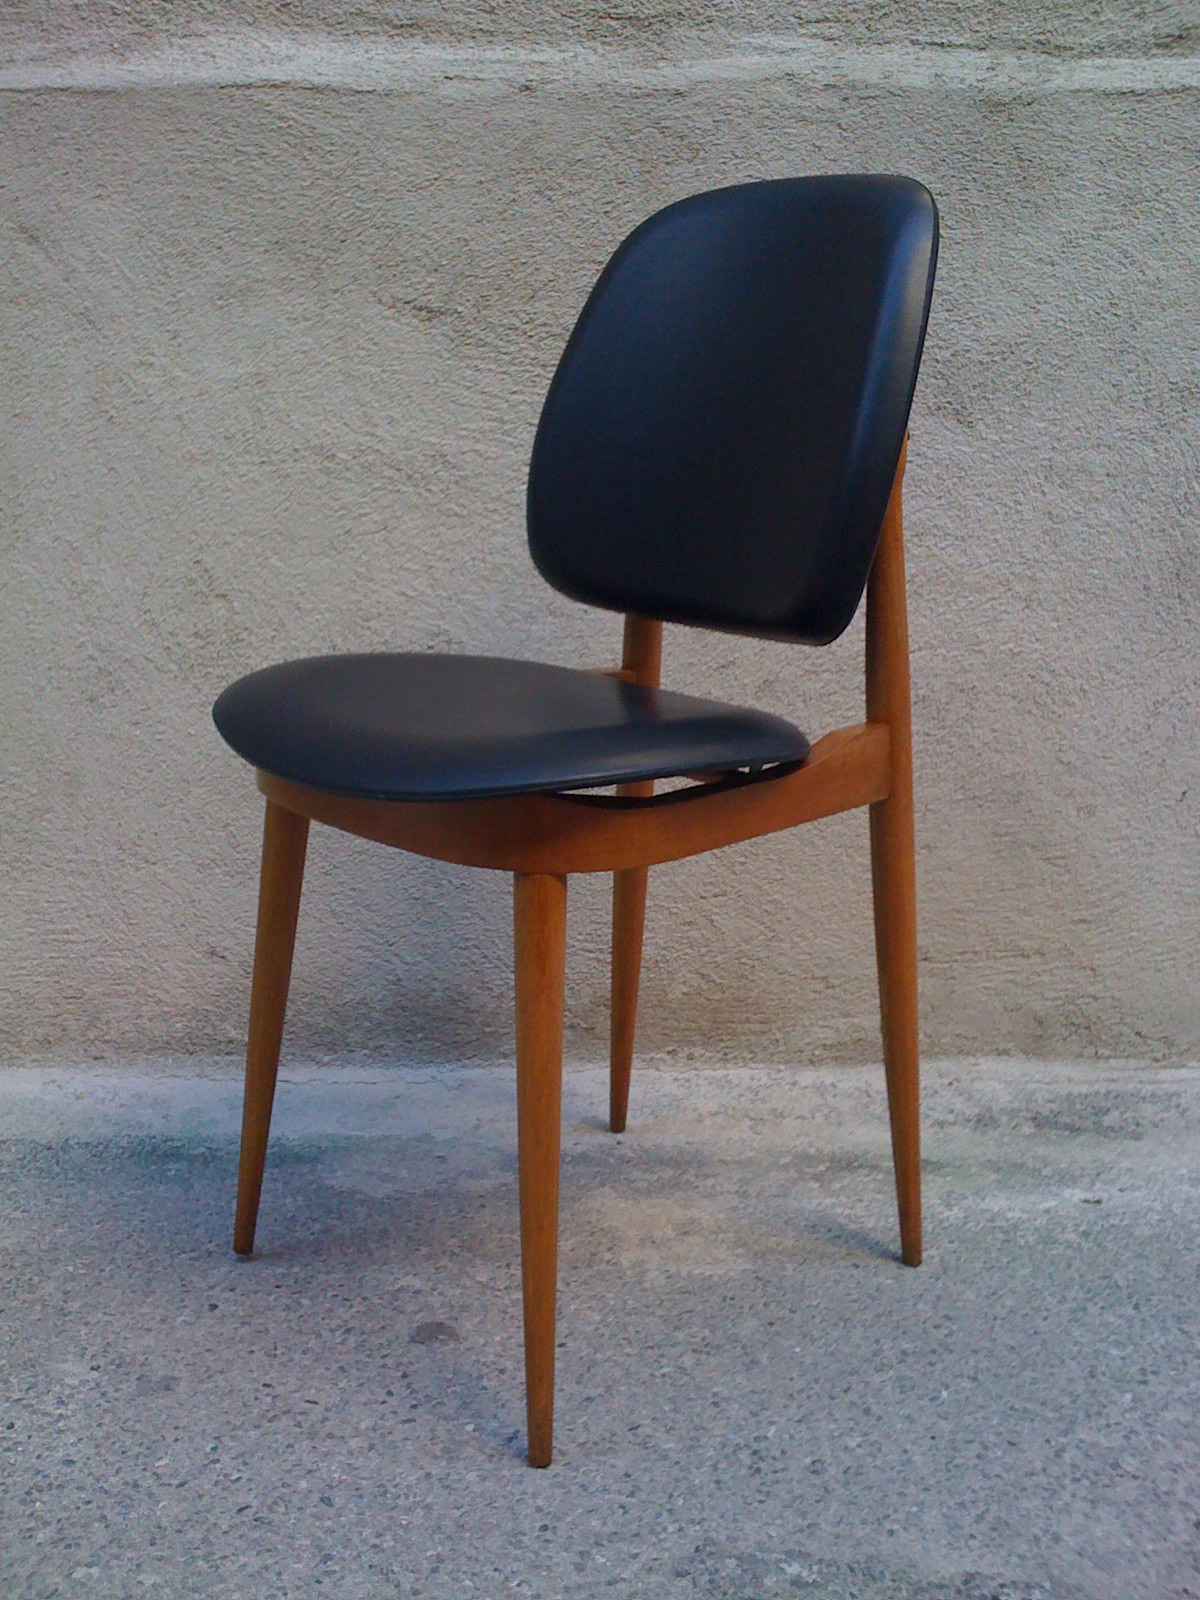 Baos chaise de salle manger pierre guariche ann es 60 for Salle a manger annee 70